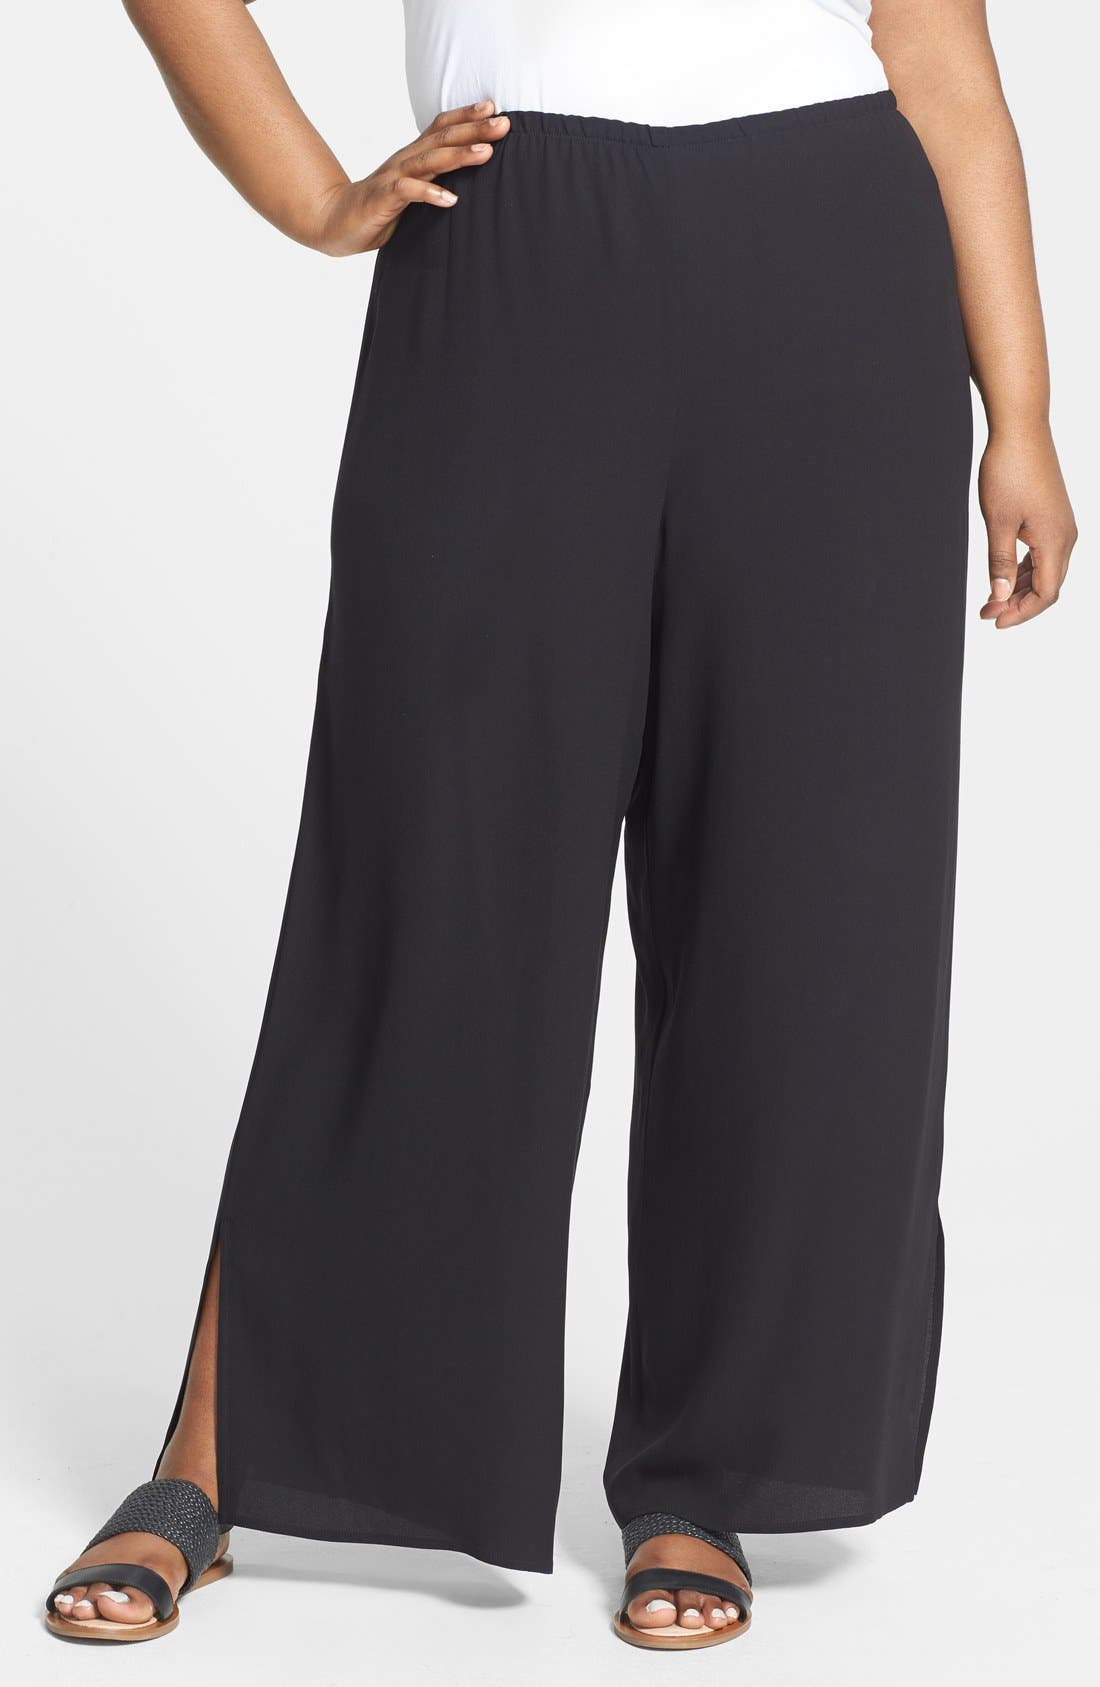 Alternate Image 1 Selected - Eileen Fisher Slit Hem Silk Georgette Crepe Wide Leg Pants (Plus Size)